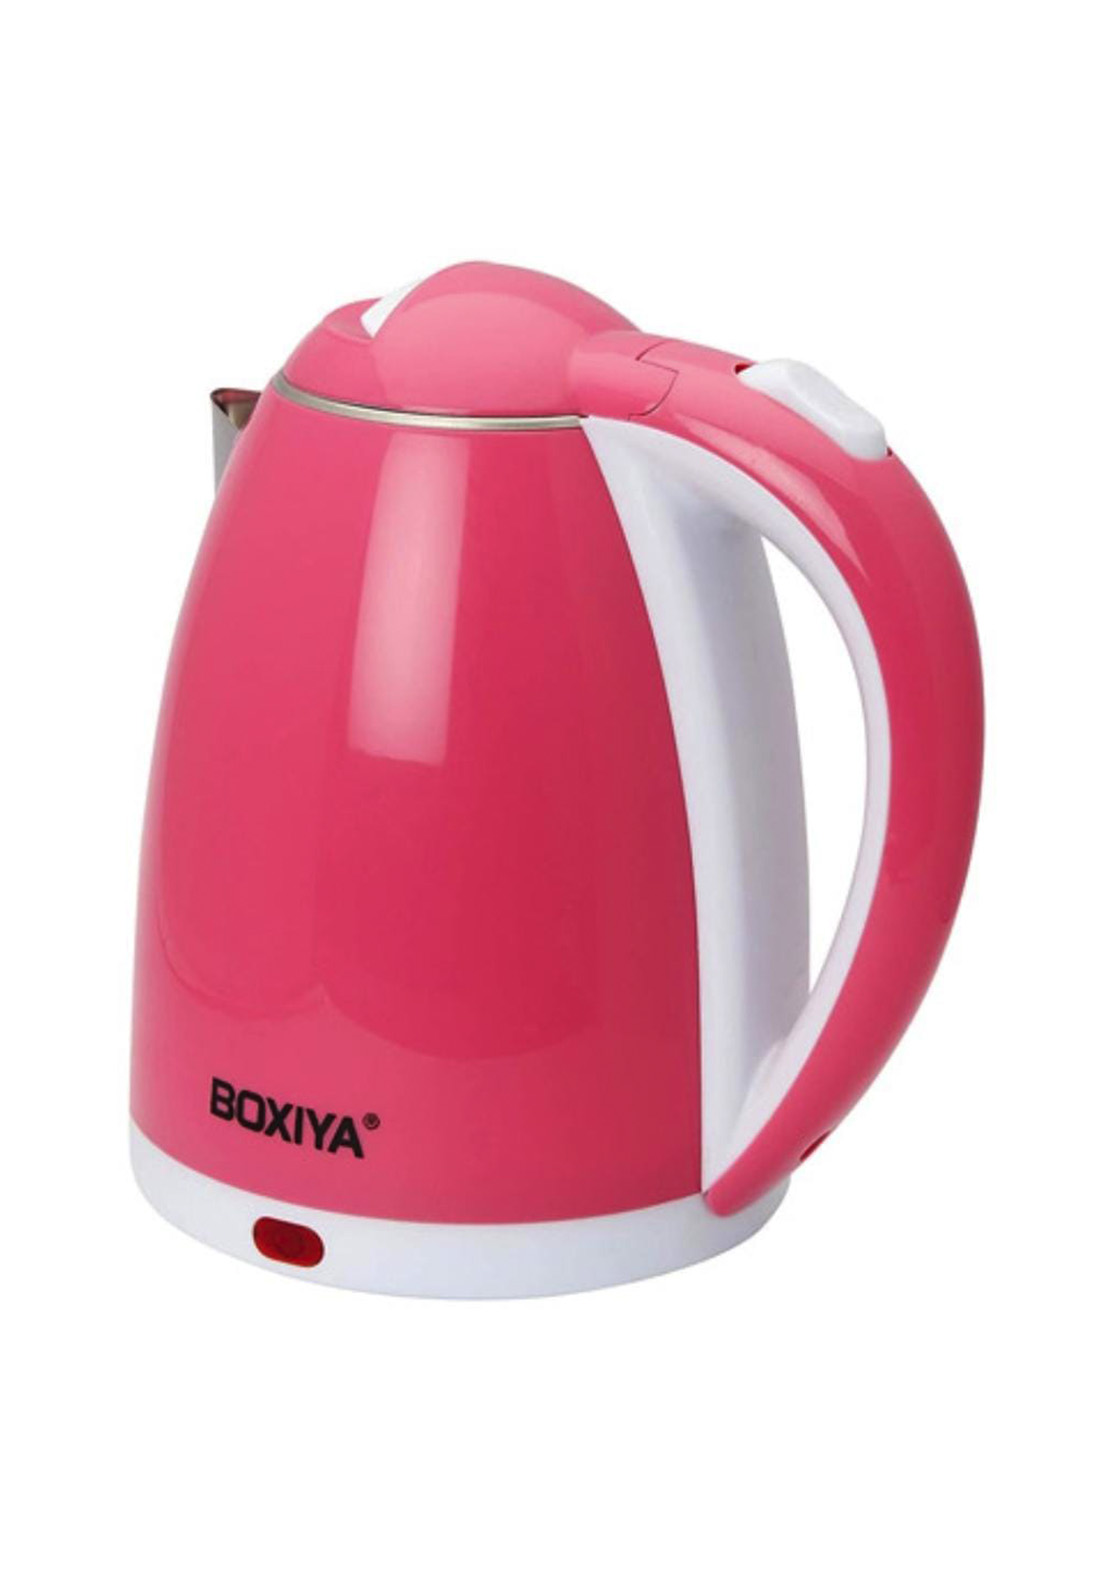 Boxiya Fast Electric Kettle غلاية كهربائية